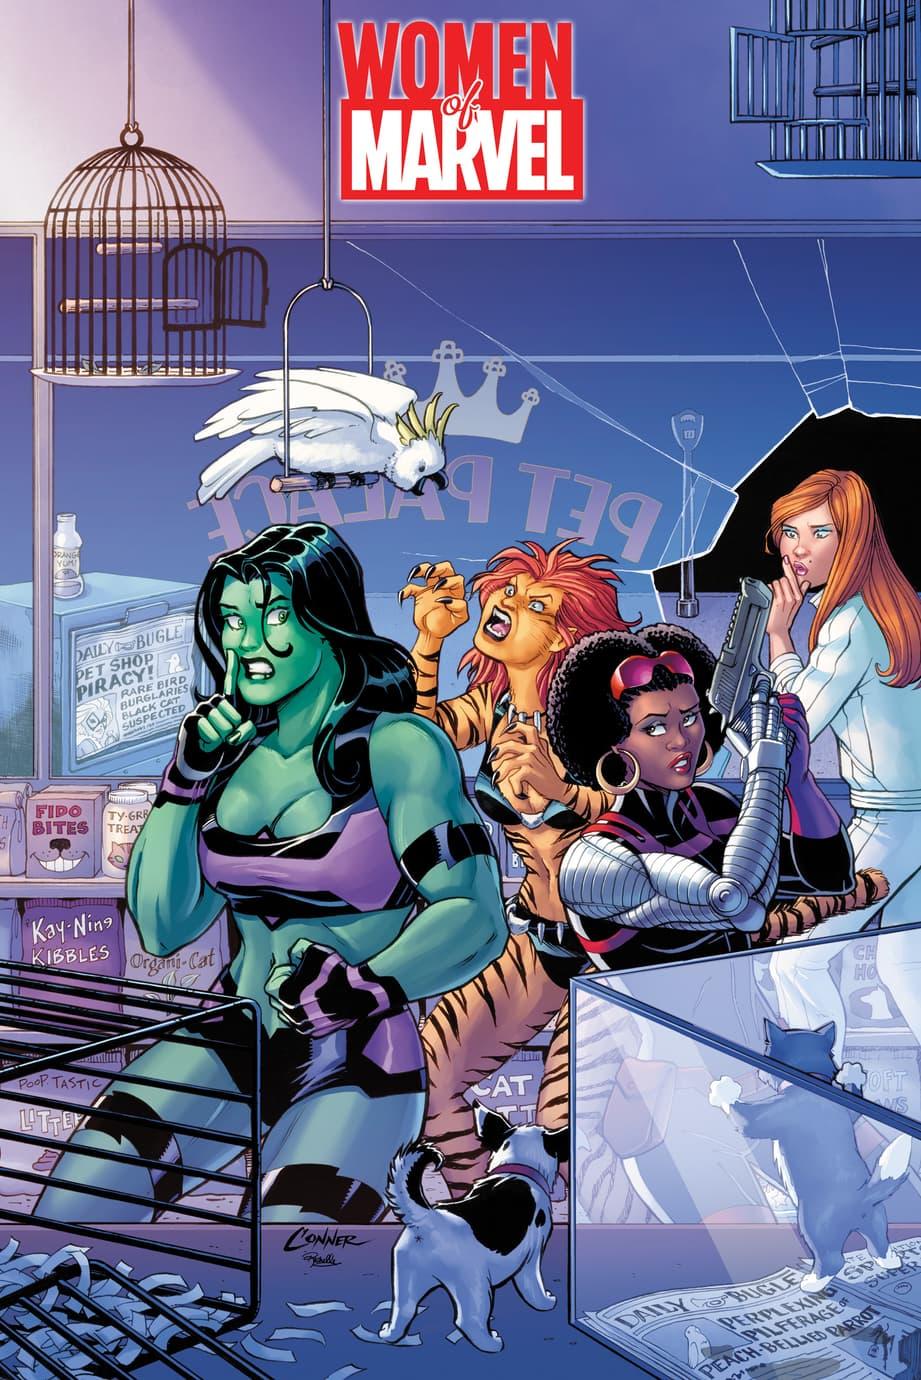 Women of Marvel variant by Amanda Conner